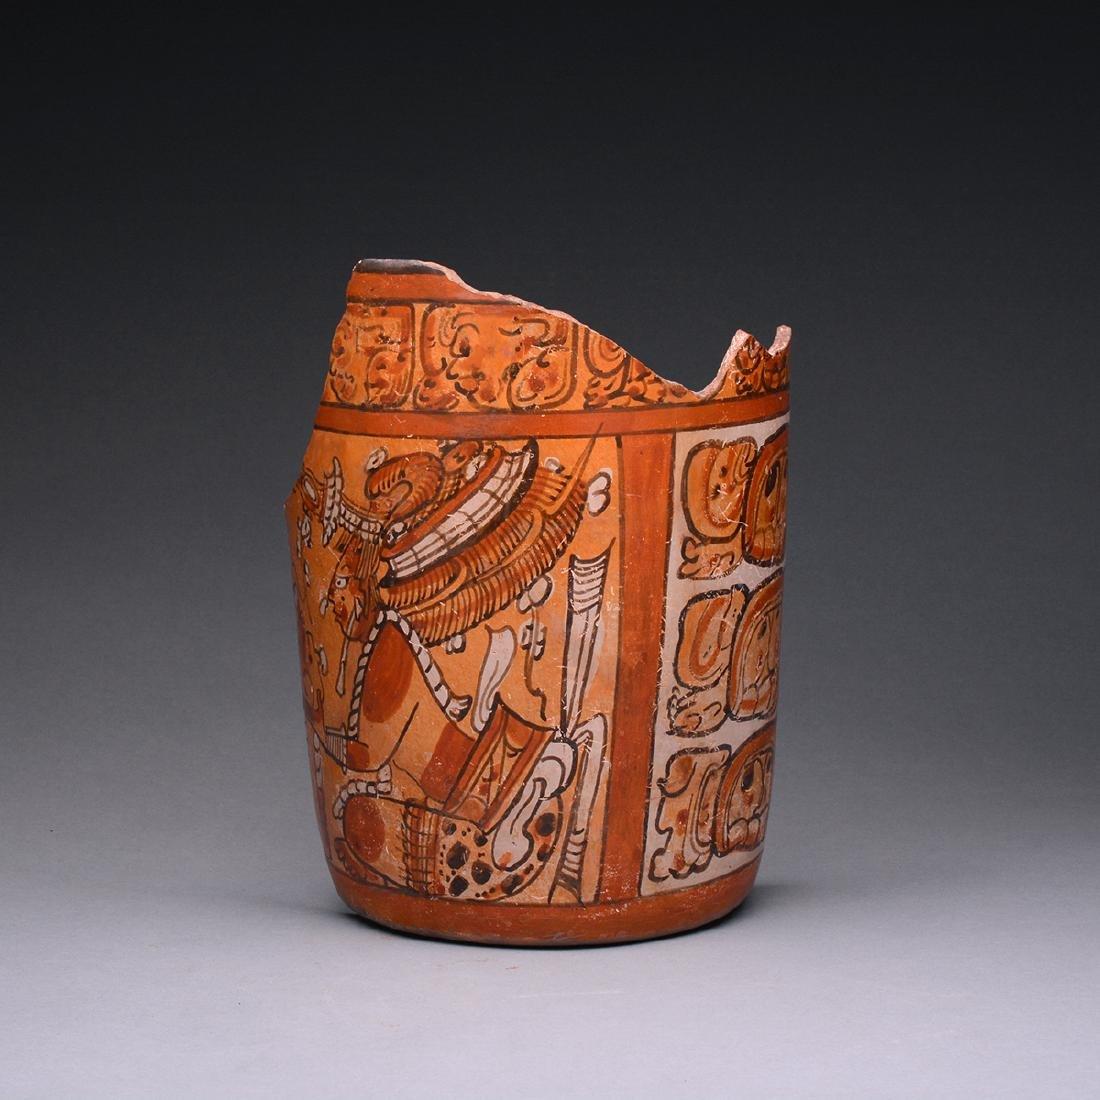 Mayan Polychrome Cylindrical Vase Fragment